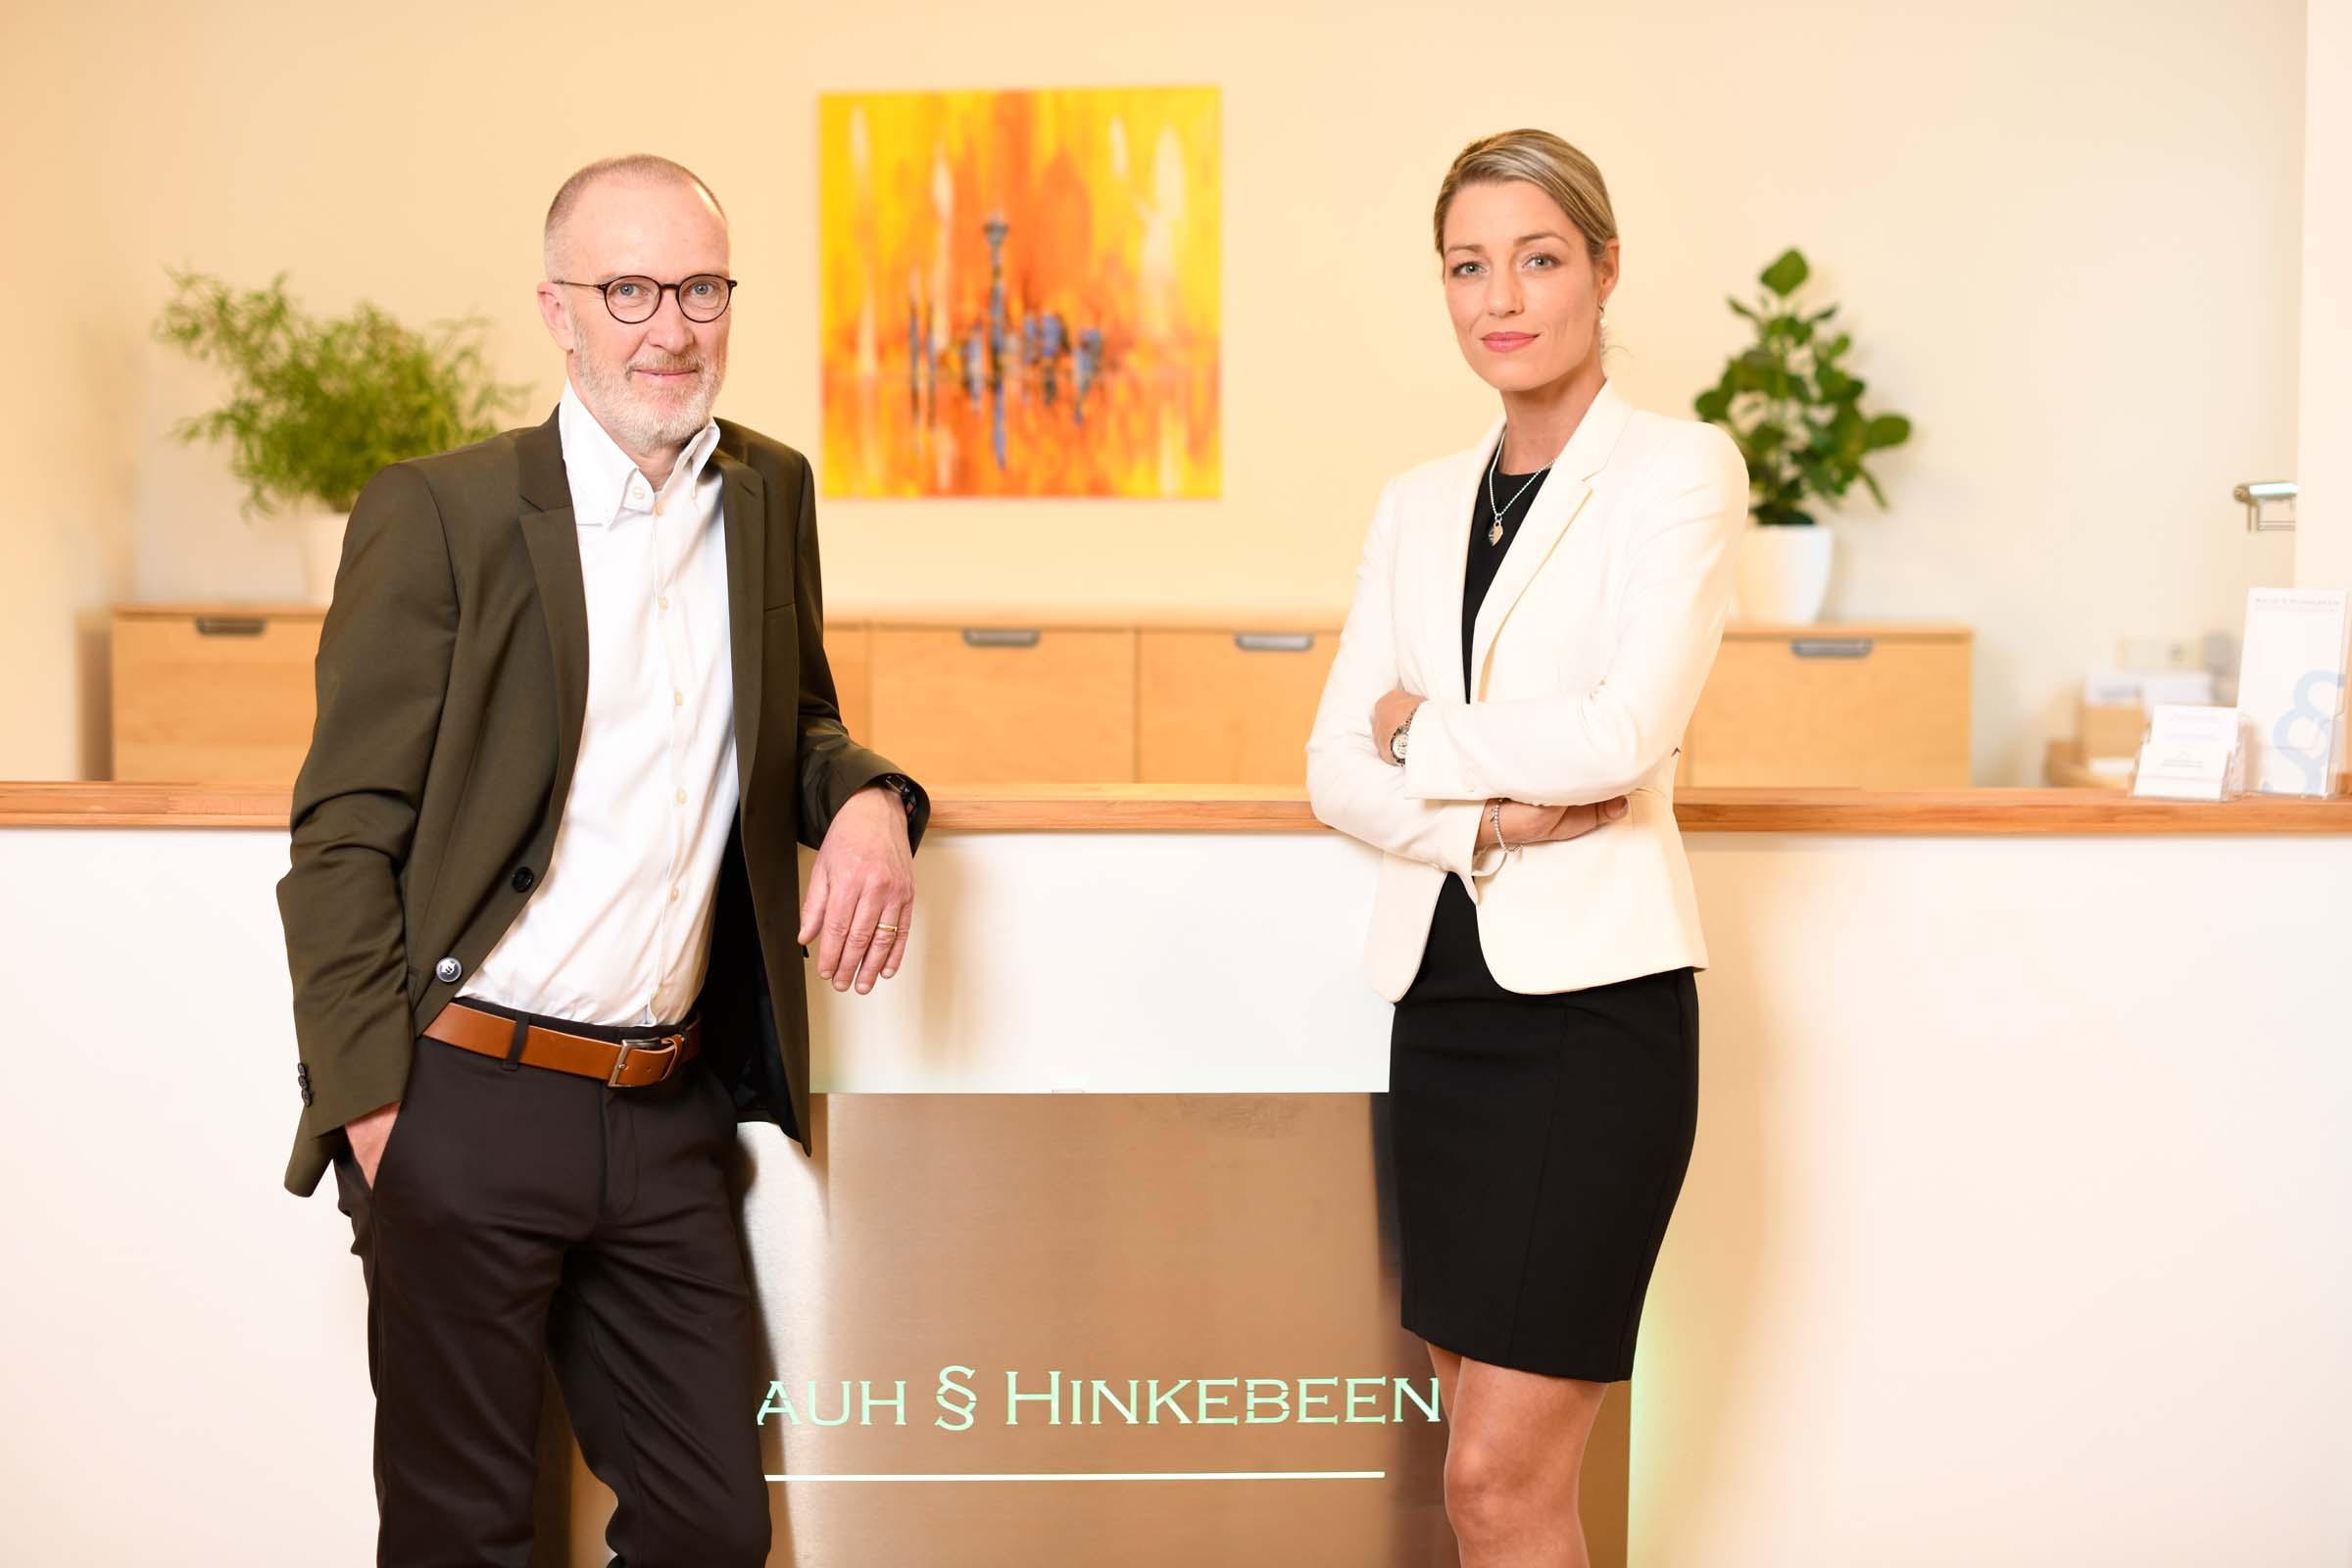 Rechtsanwalt Stephan Rauh und Rechtsanwältin Nadine Hinkebeen